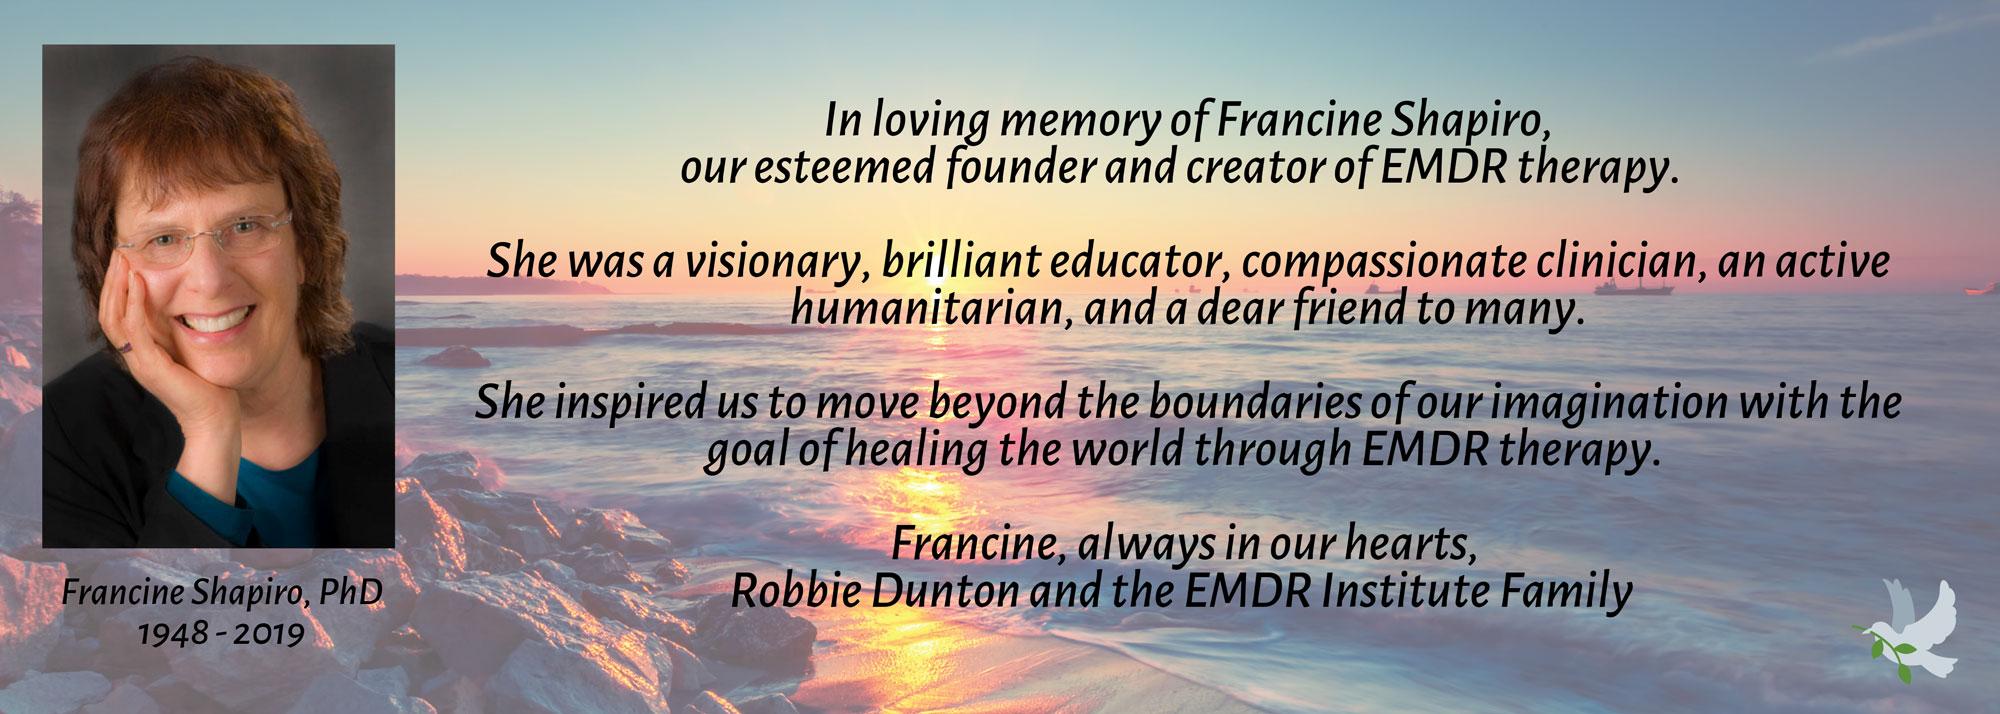 EMDR_Anniversary-Tribute_Francine